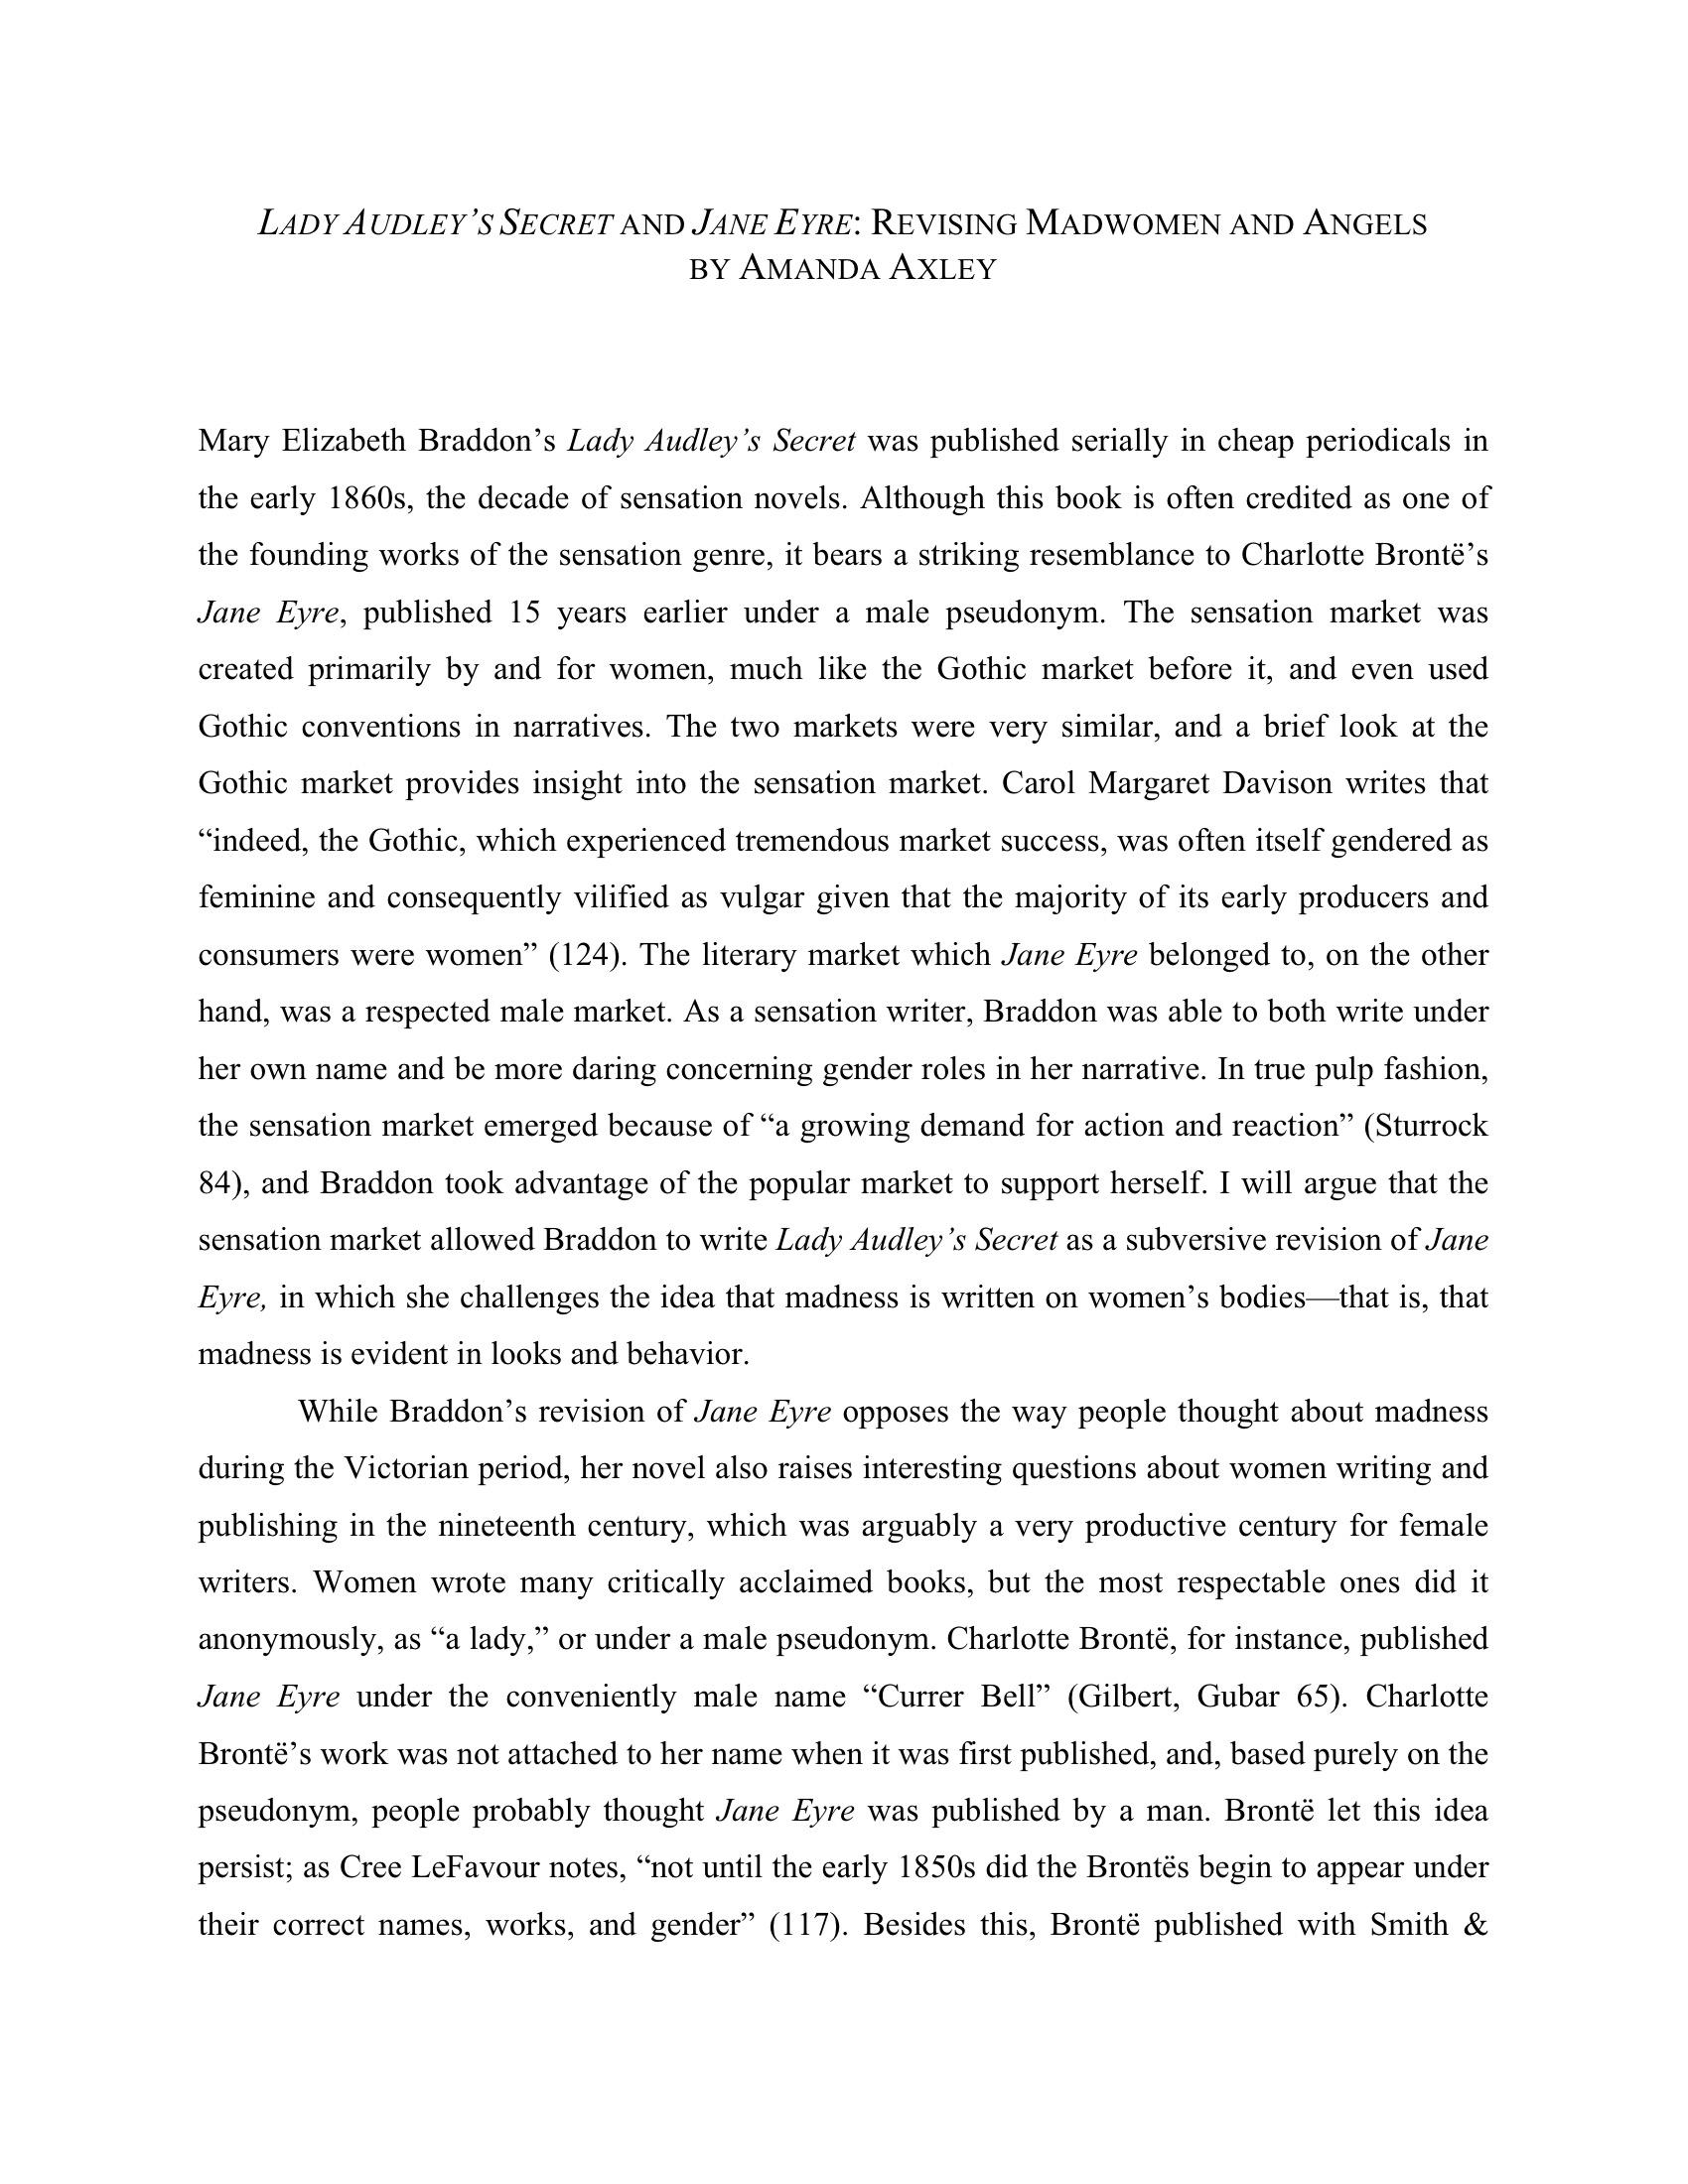 Lady Audrey's Secret and Jane Eyre_ Revising Madwomen and Angels - Amanda Axley-1.jpeg